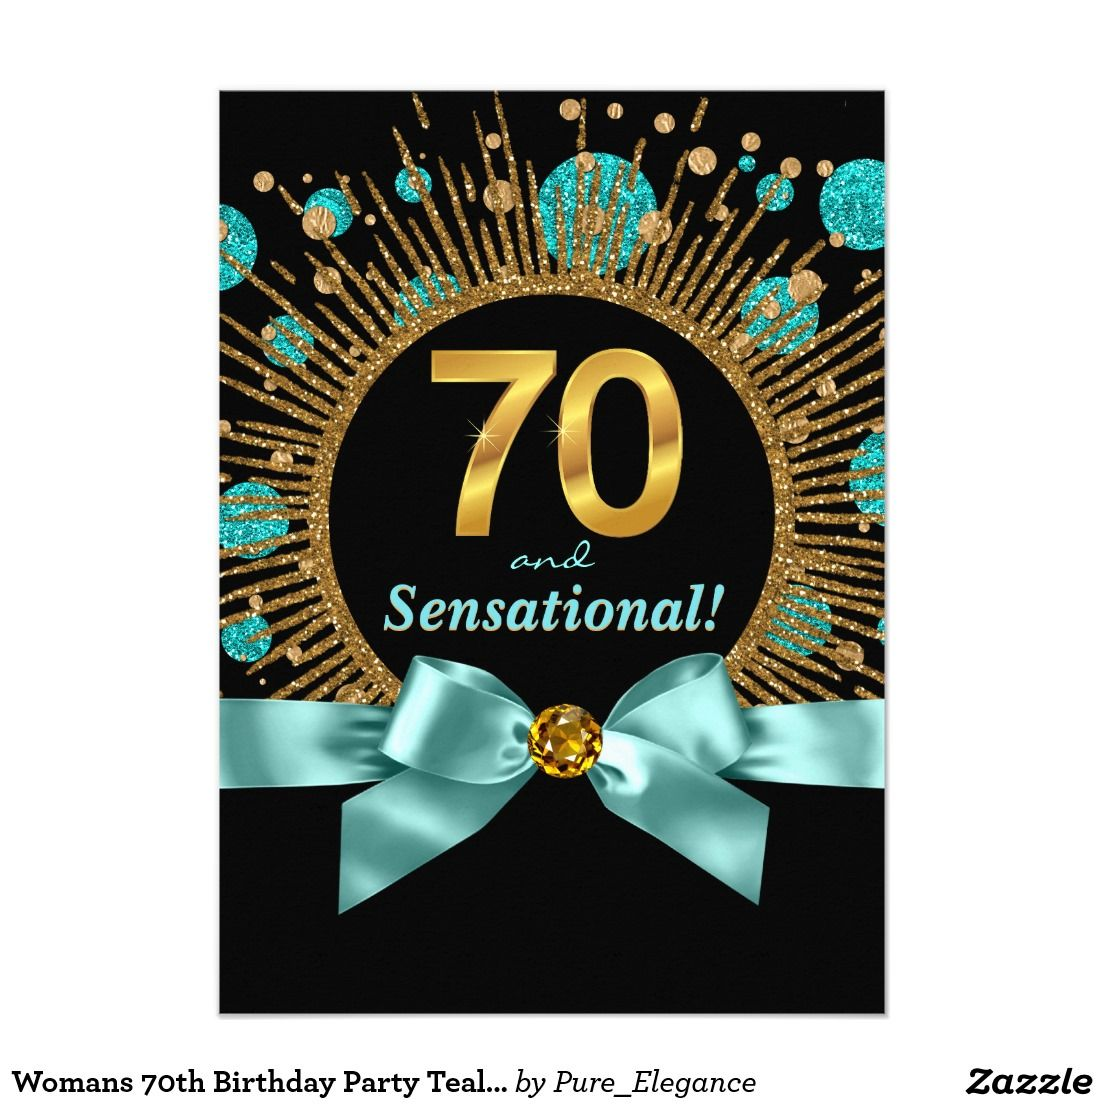 Medium Of 70th Birthday Party Ideas